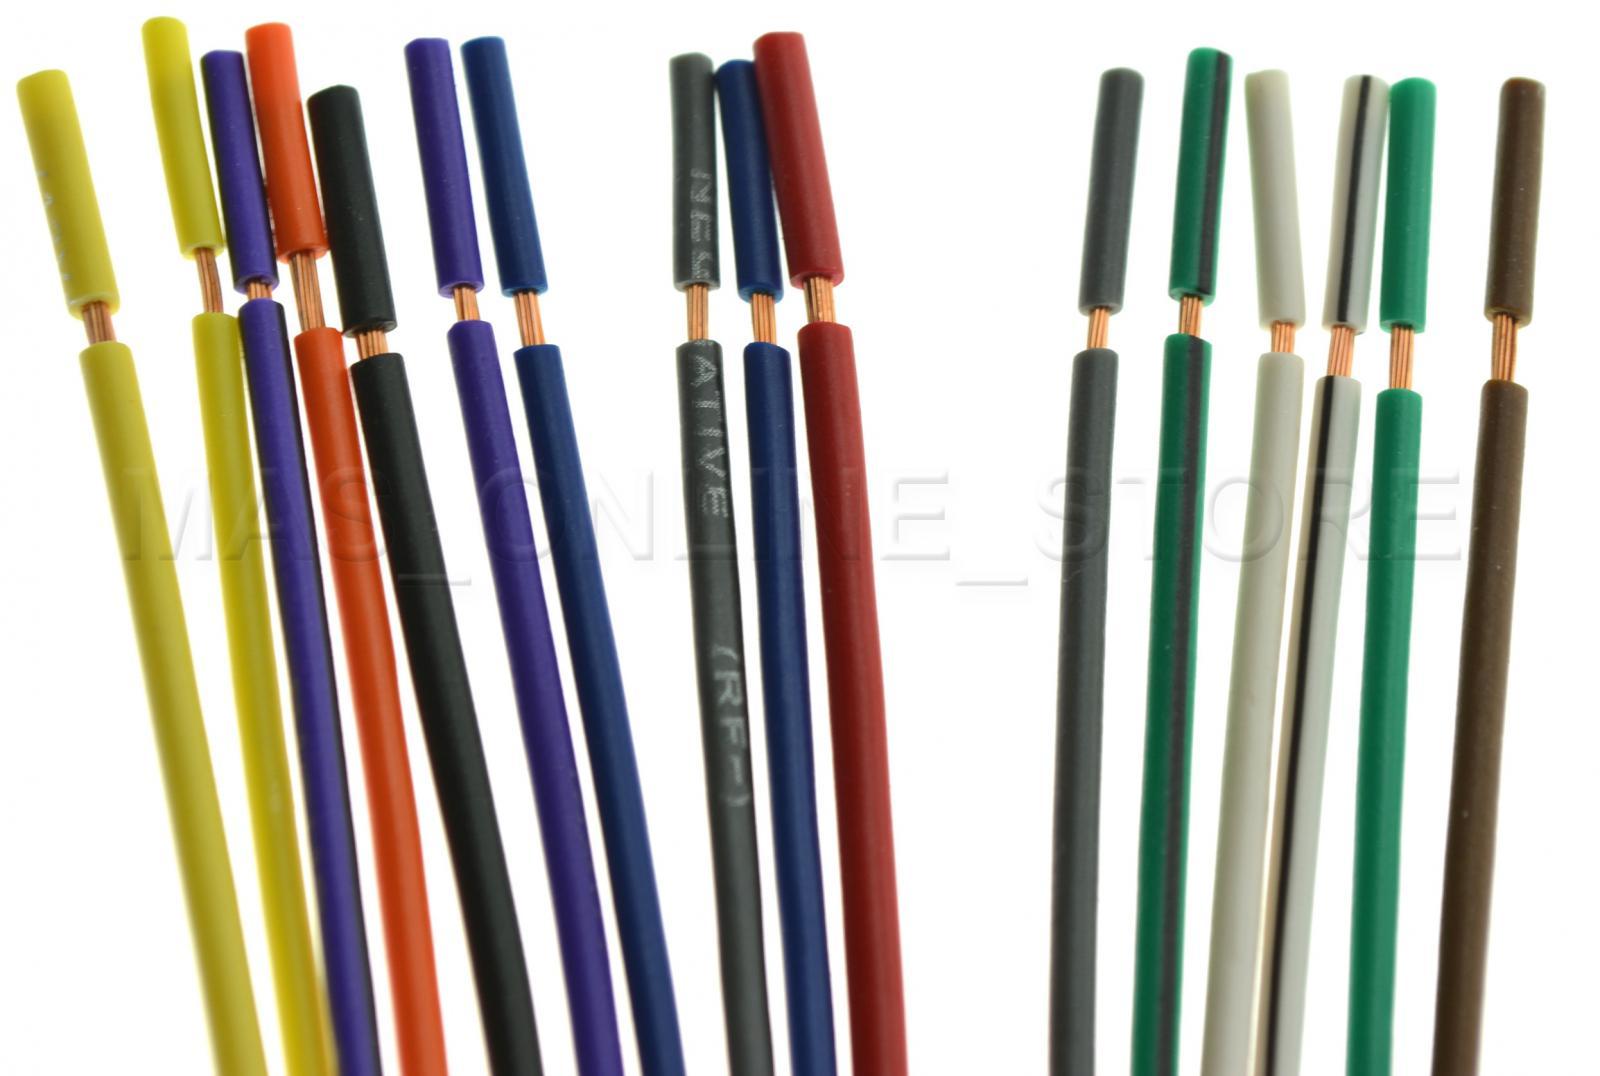 V cz 101 clarion wiring diagram dolgular com  at sewacar.co